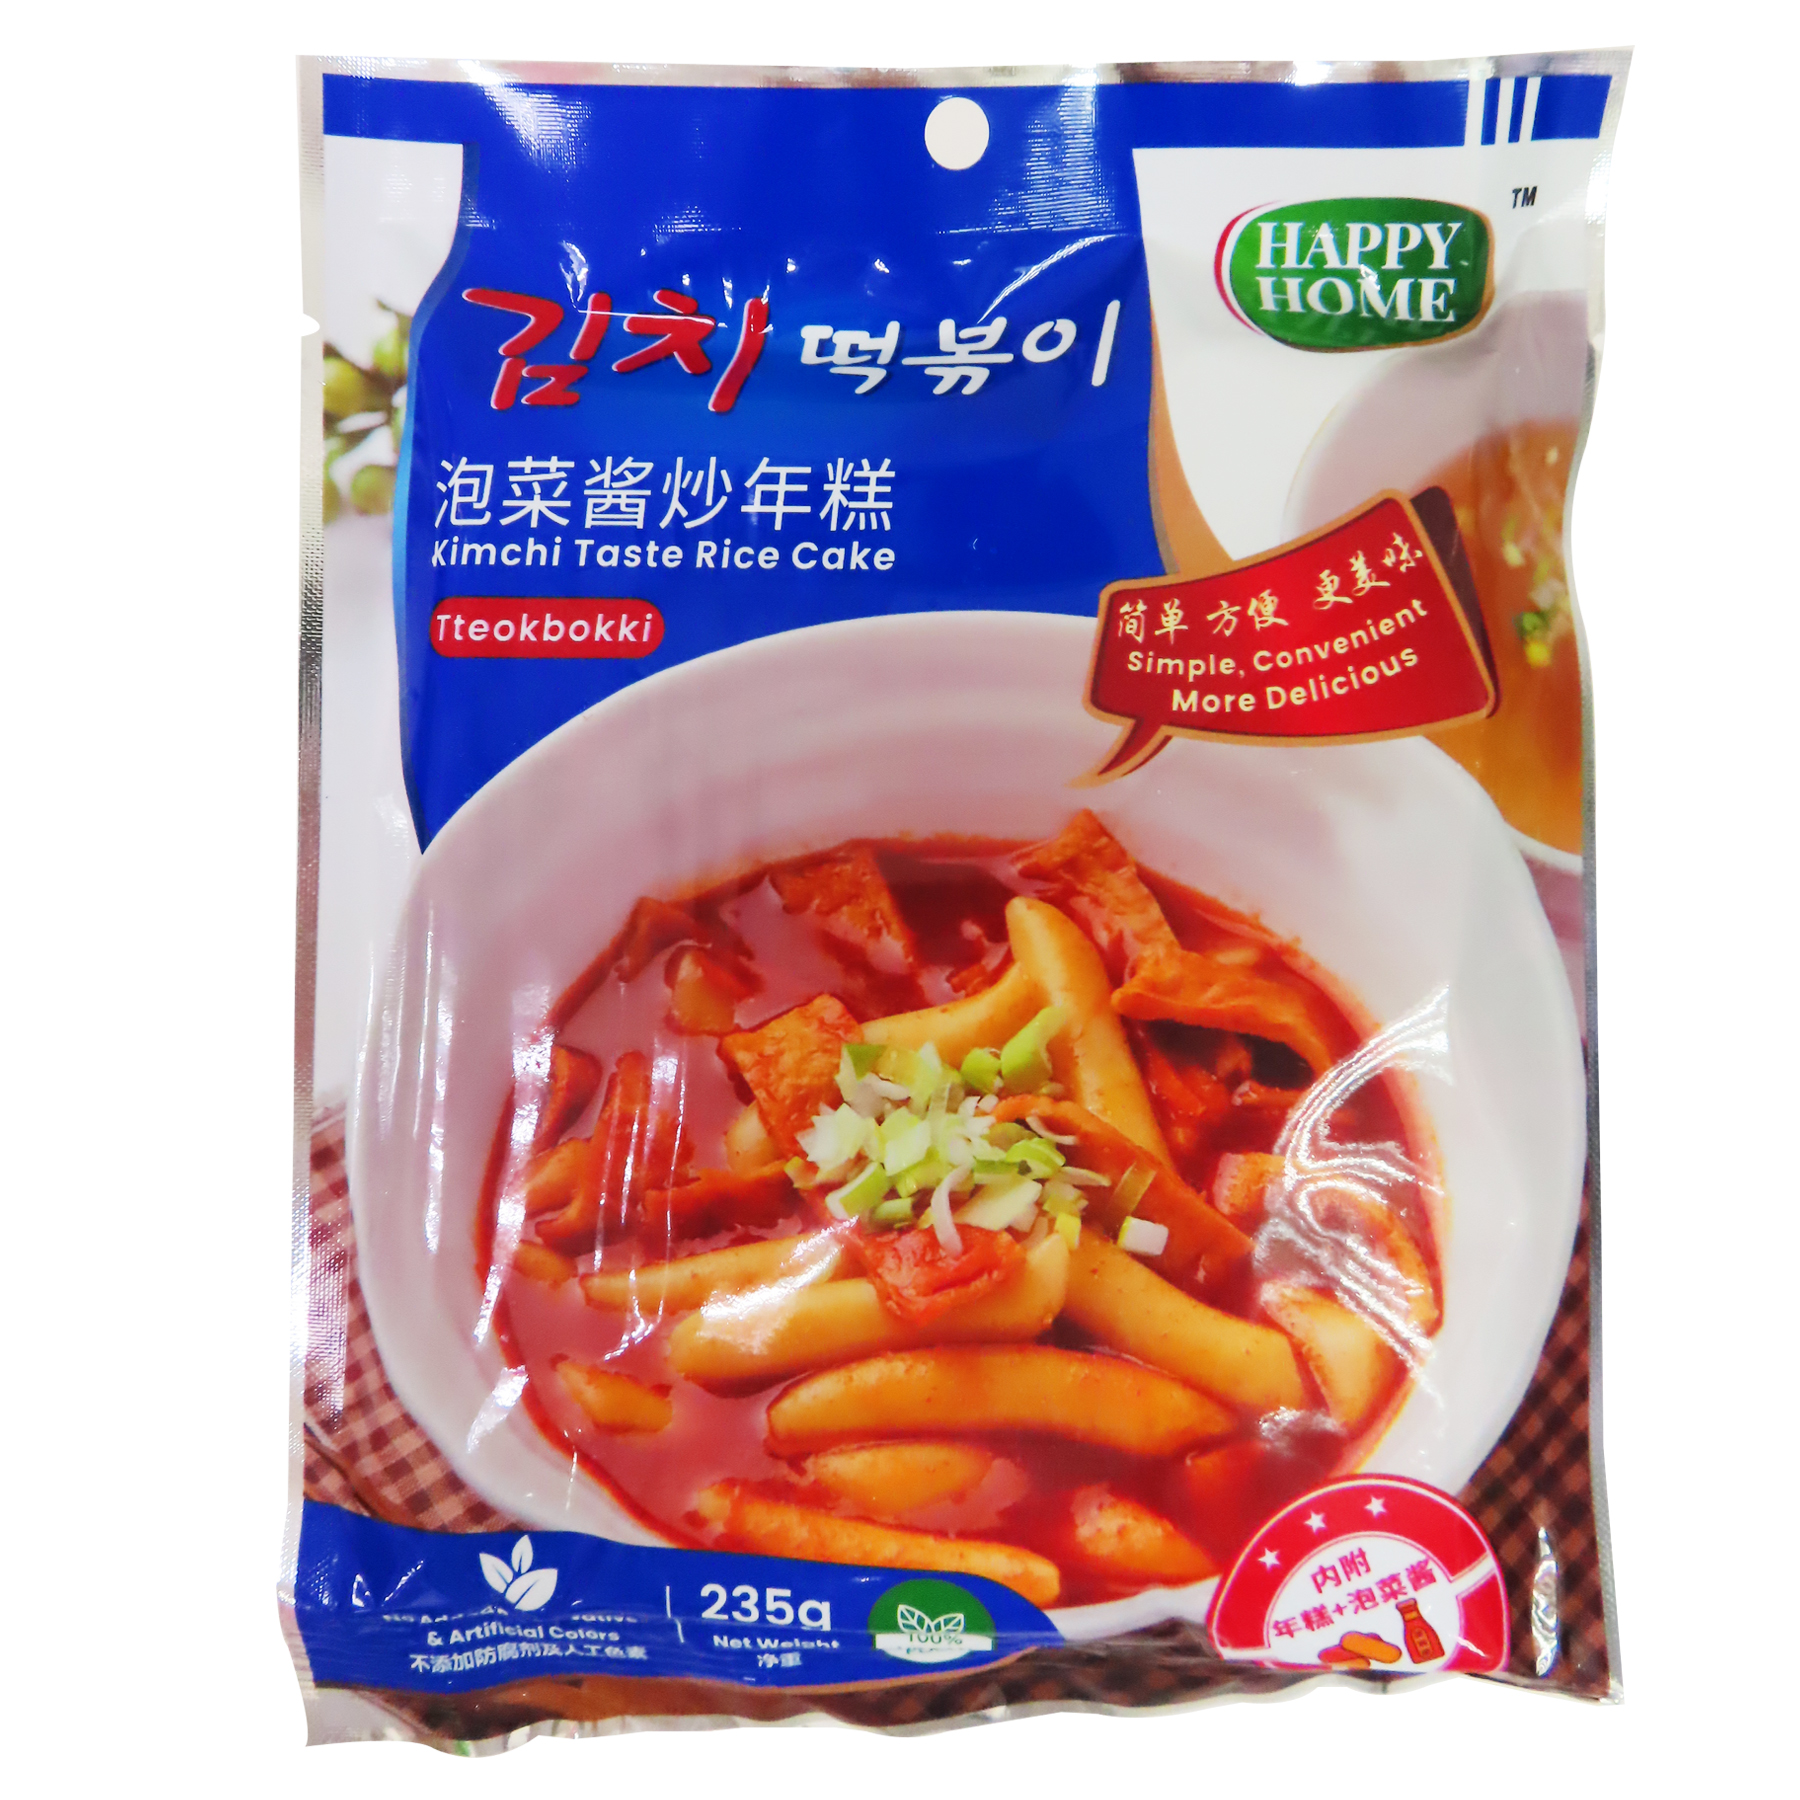 Image Kimchi Taste Rice Cake 泡菜酱炒年糕(纯素) 235grams